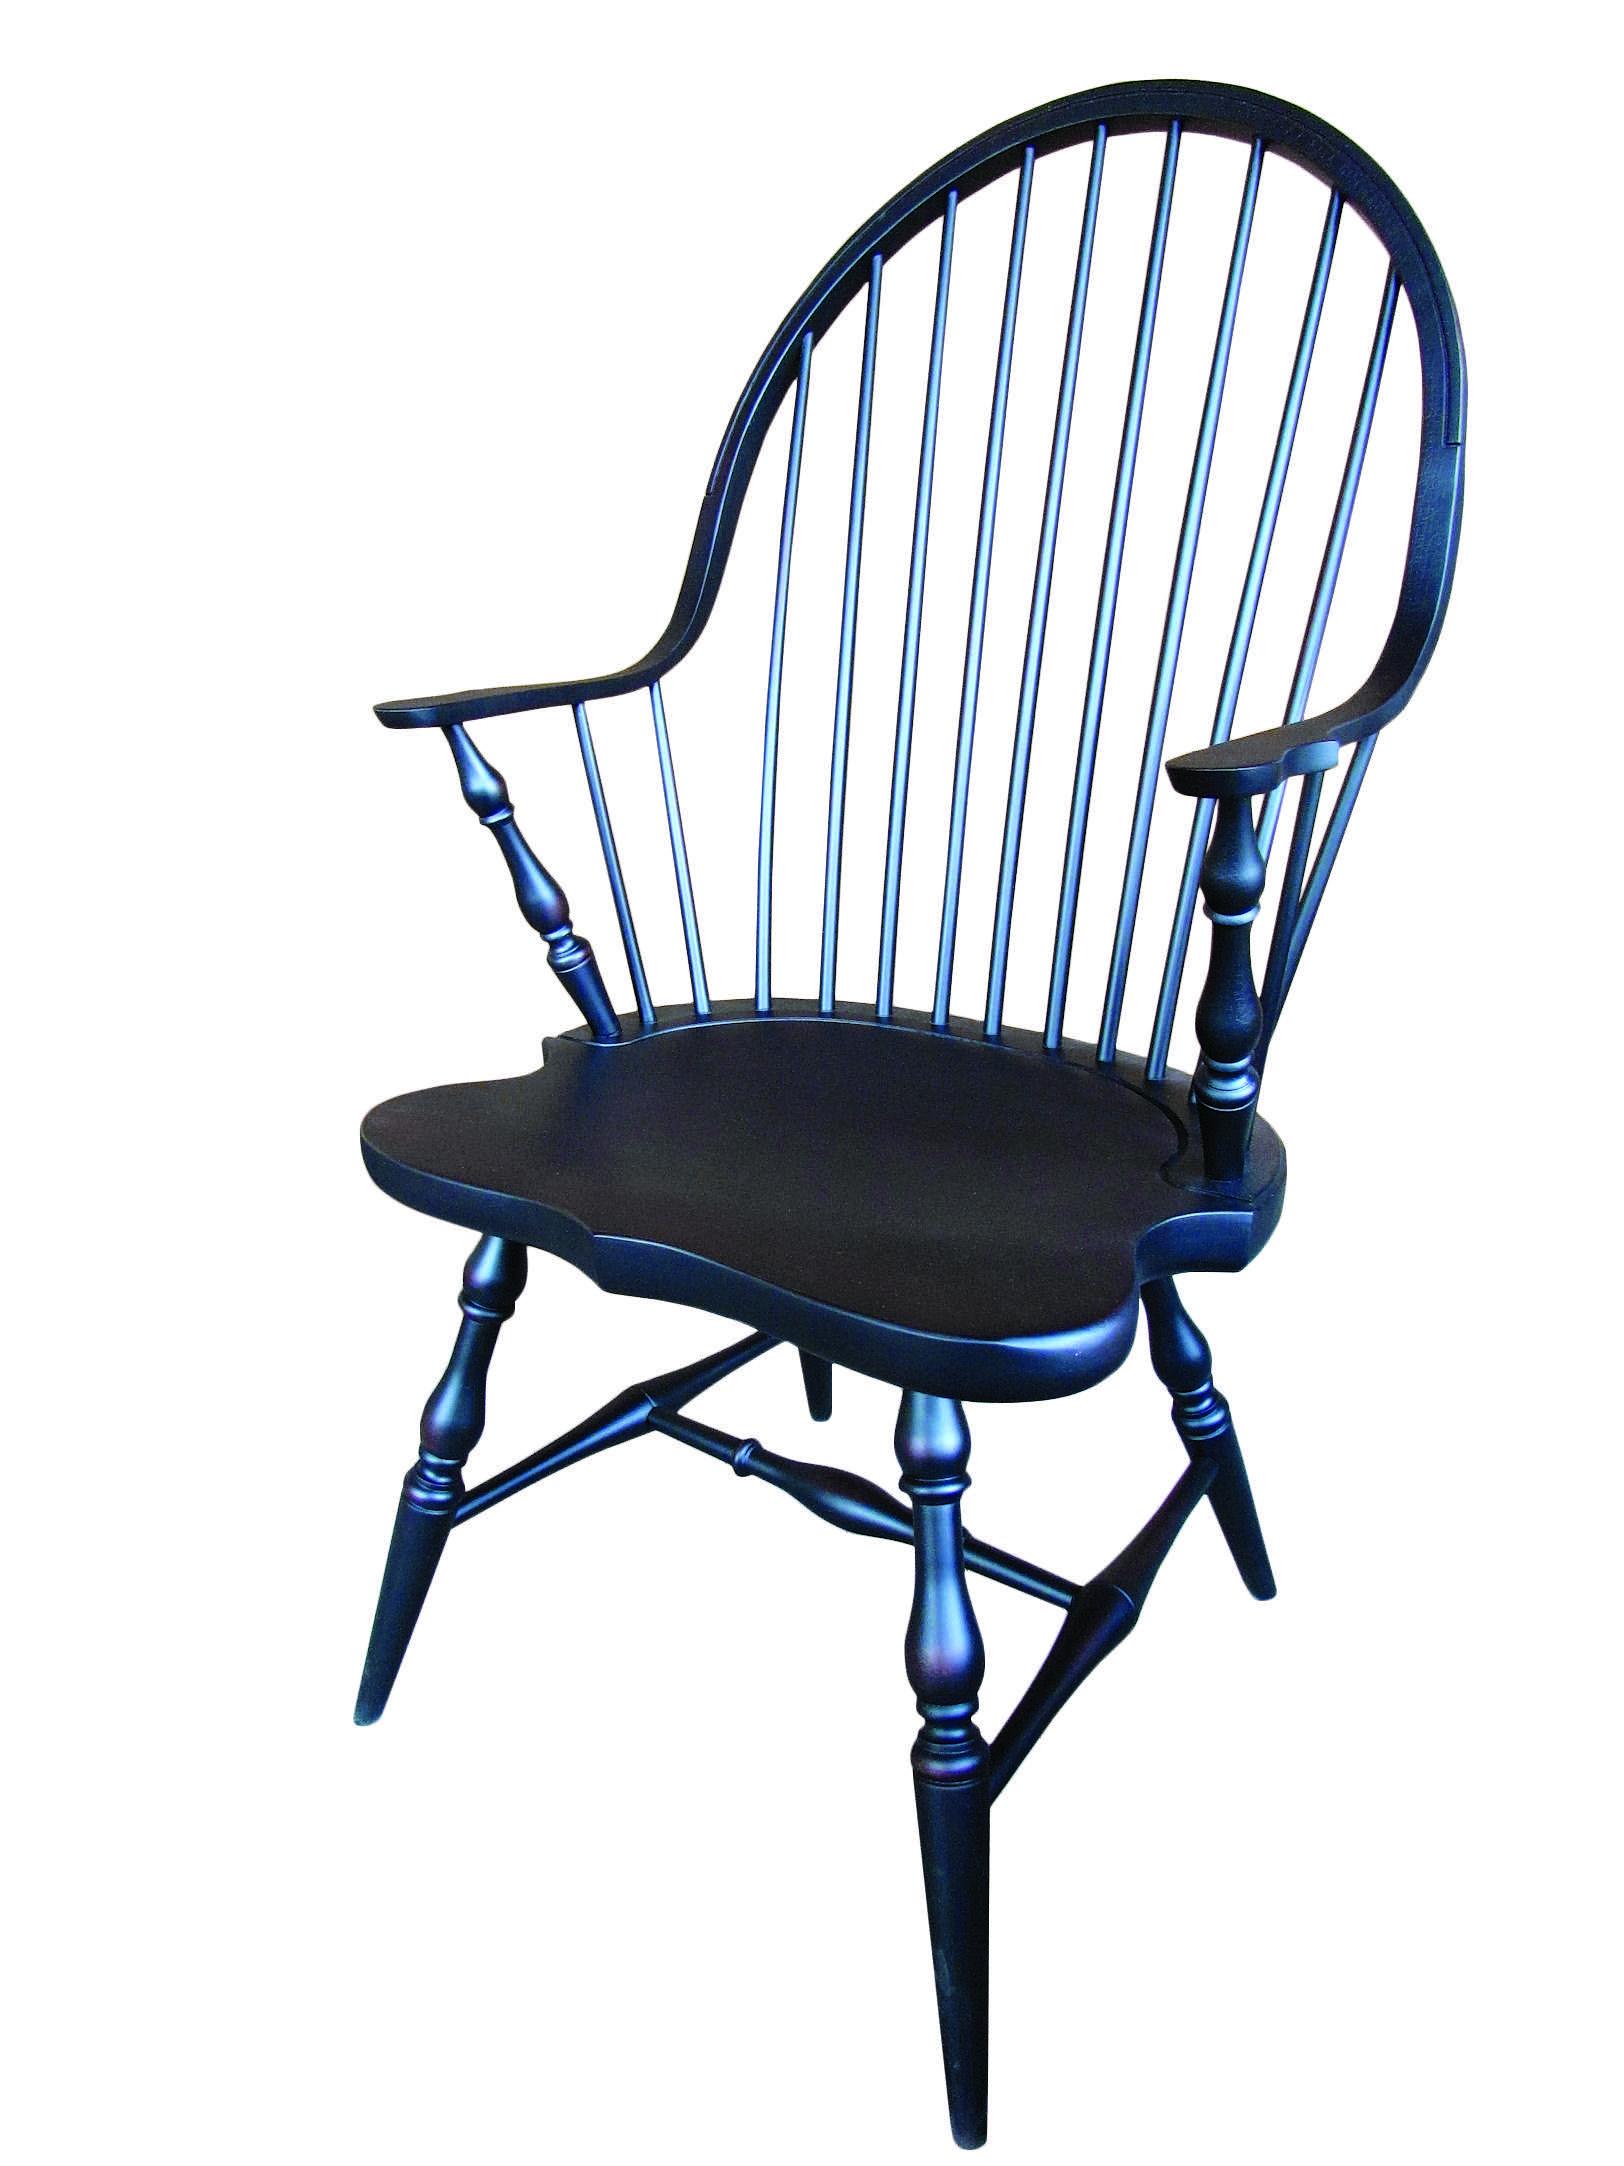 4 Martin's SILO Continuous Arm Chair_1_gn